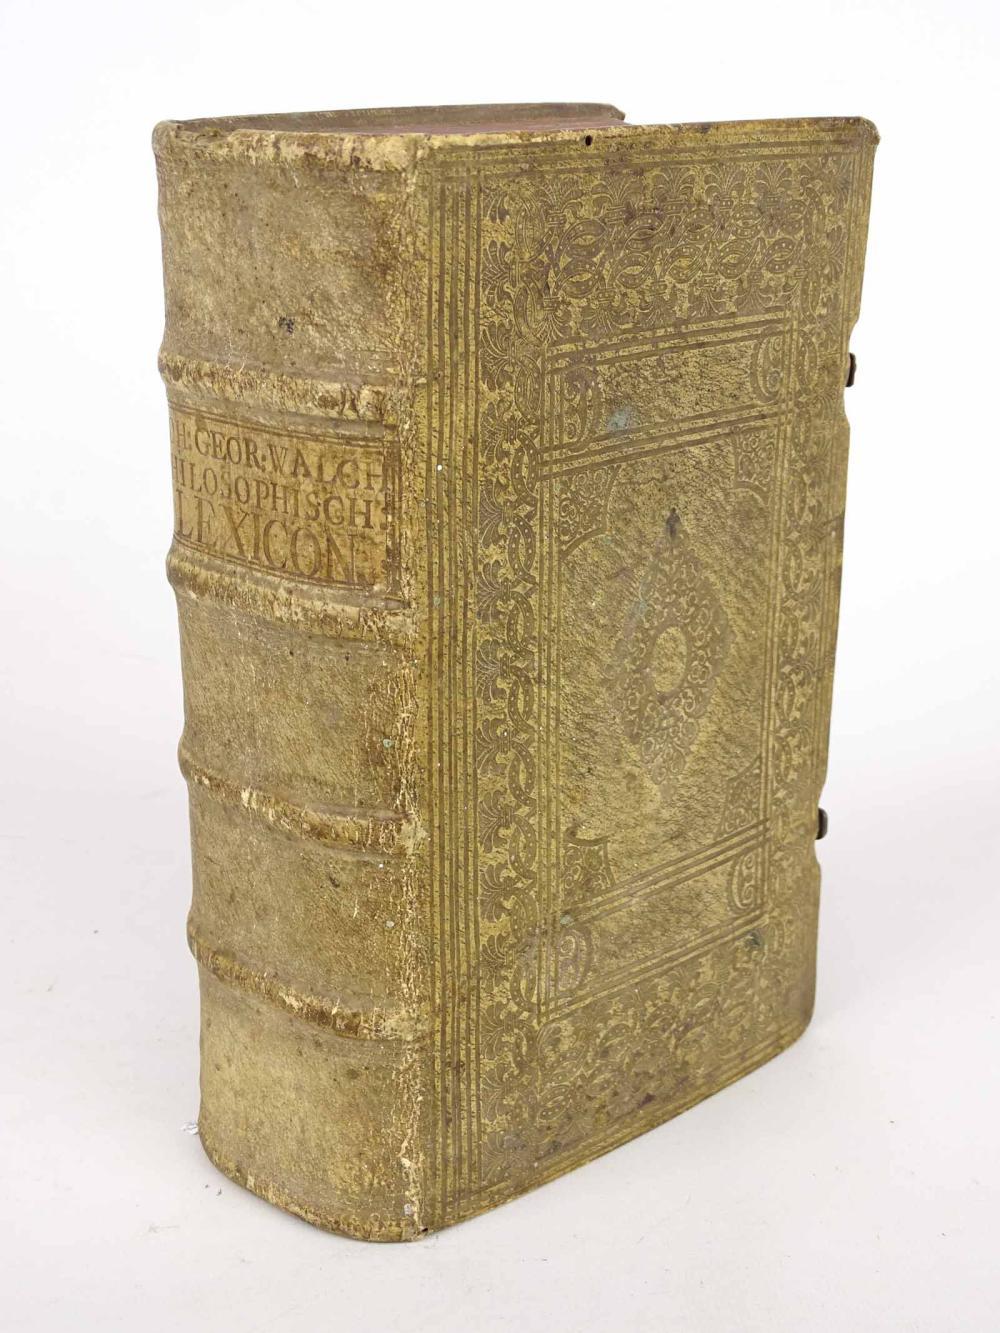 Book: JOH: GEOR: WALCH PHILOSOPHISCH LEXICON